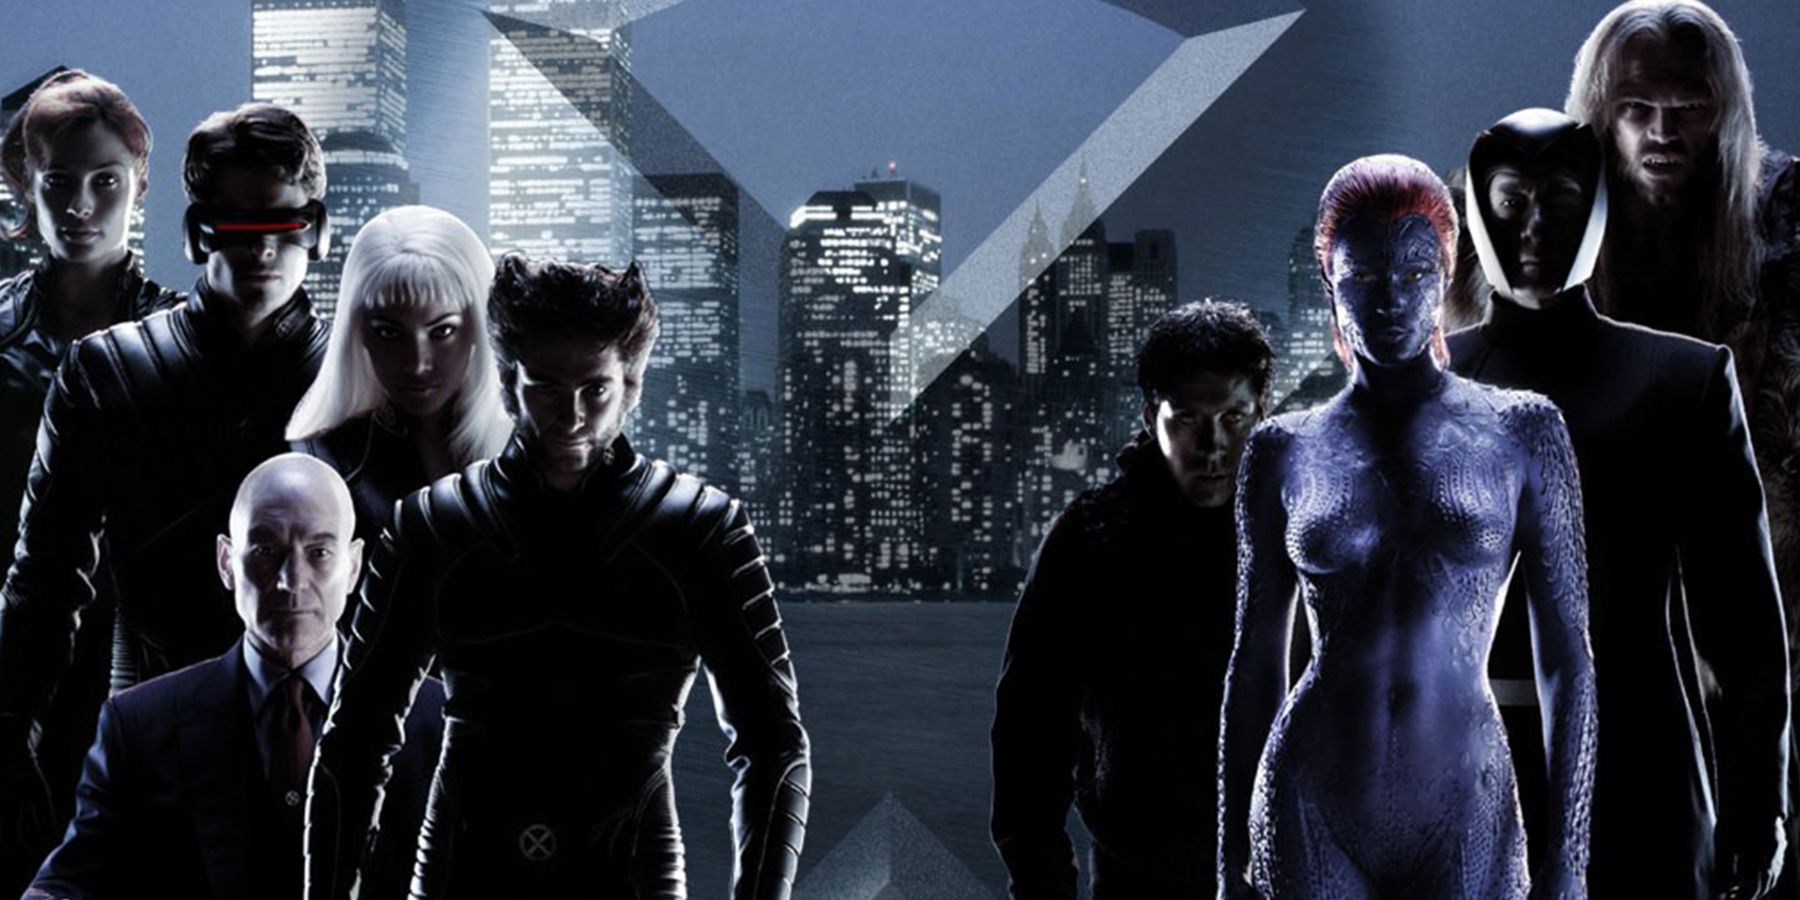 Disney & Marvel Are Lucky: Fox's X-Men Films Set the Bar Super-Low